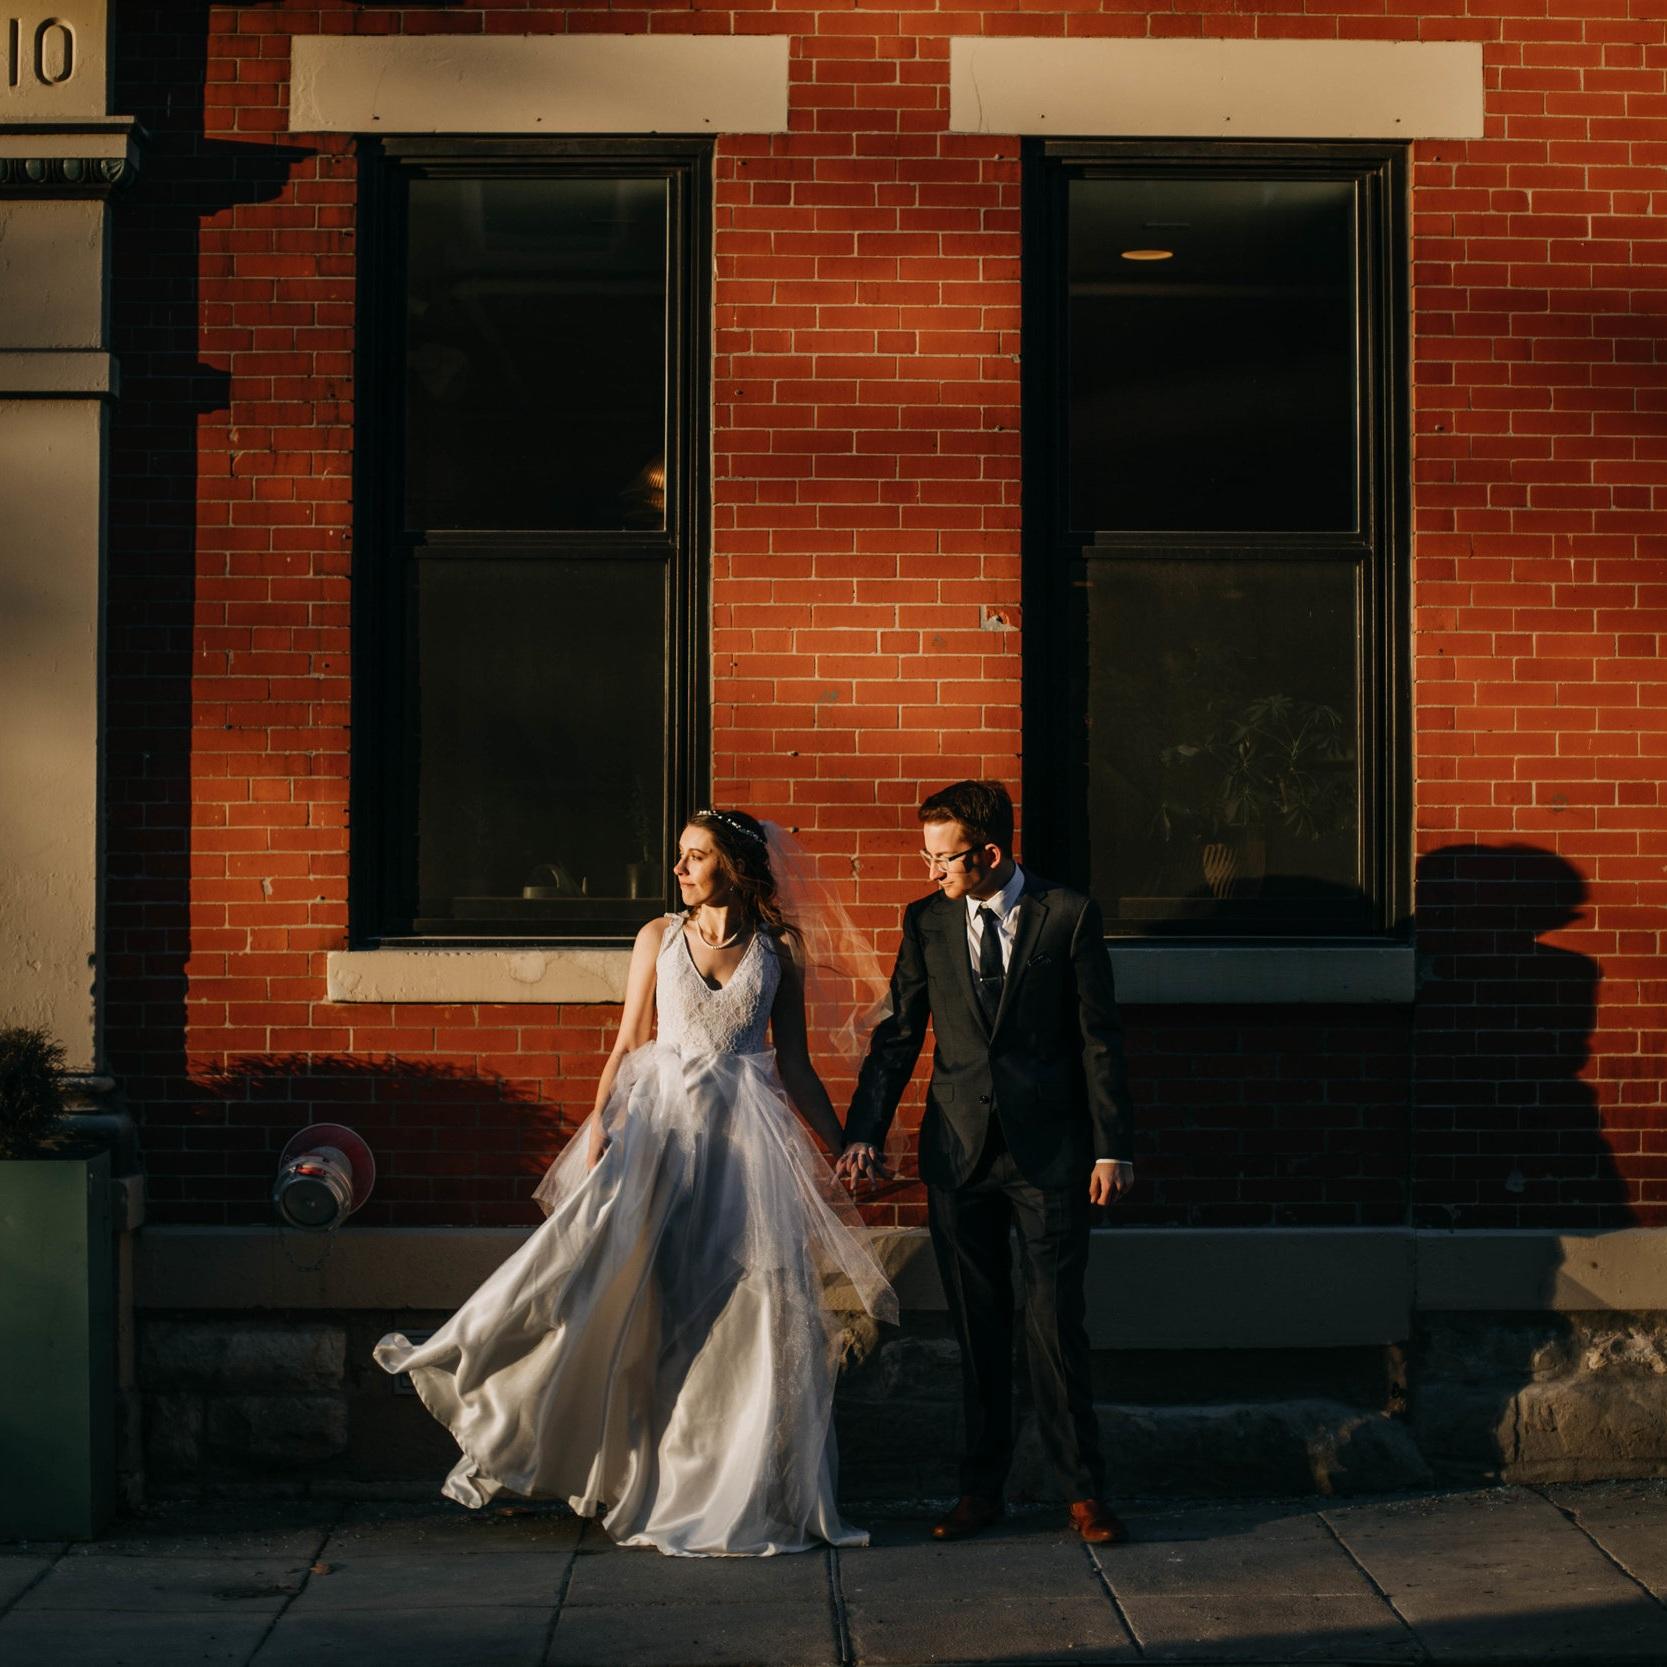 Burns Wedding - Artistic winter wedding in Cincinnati Ohio.